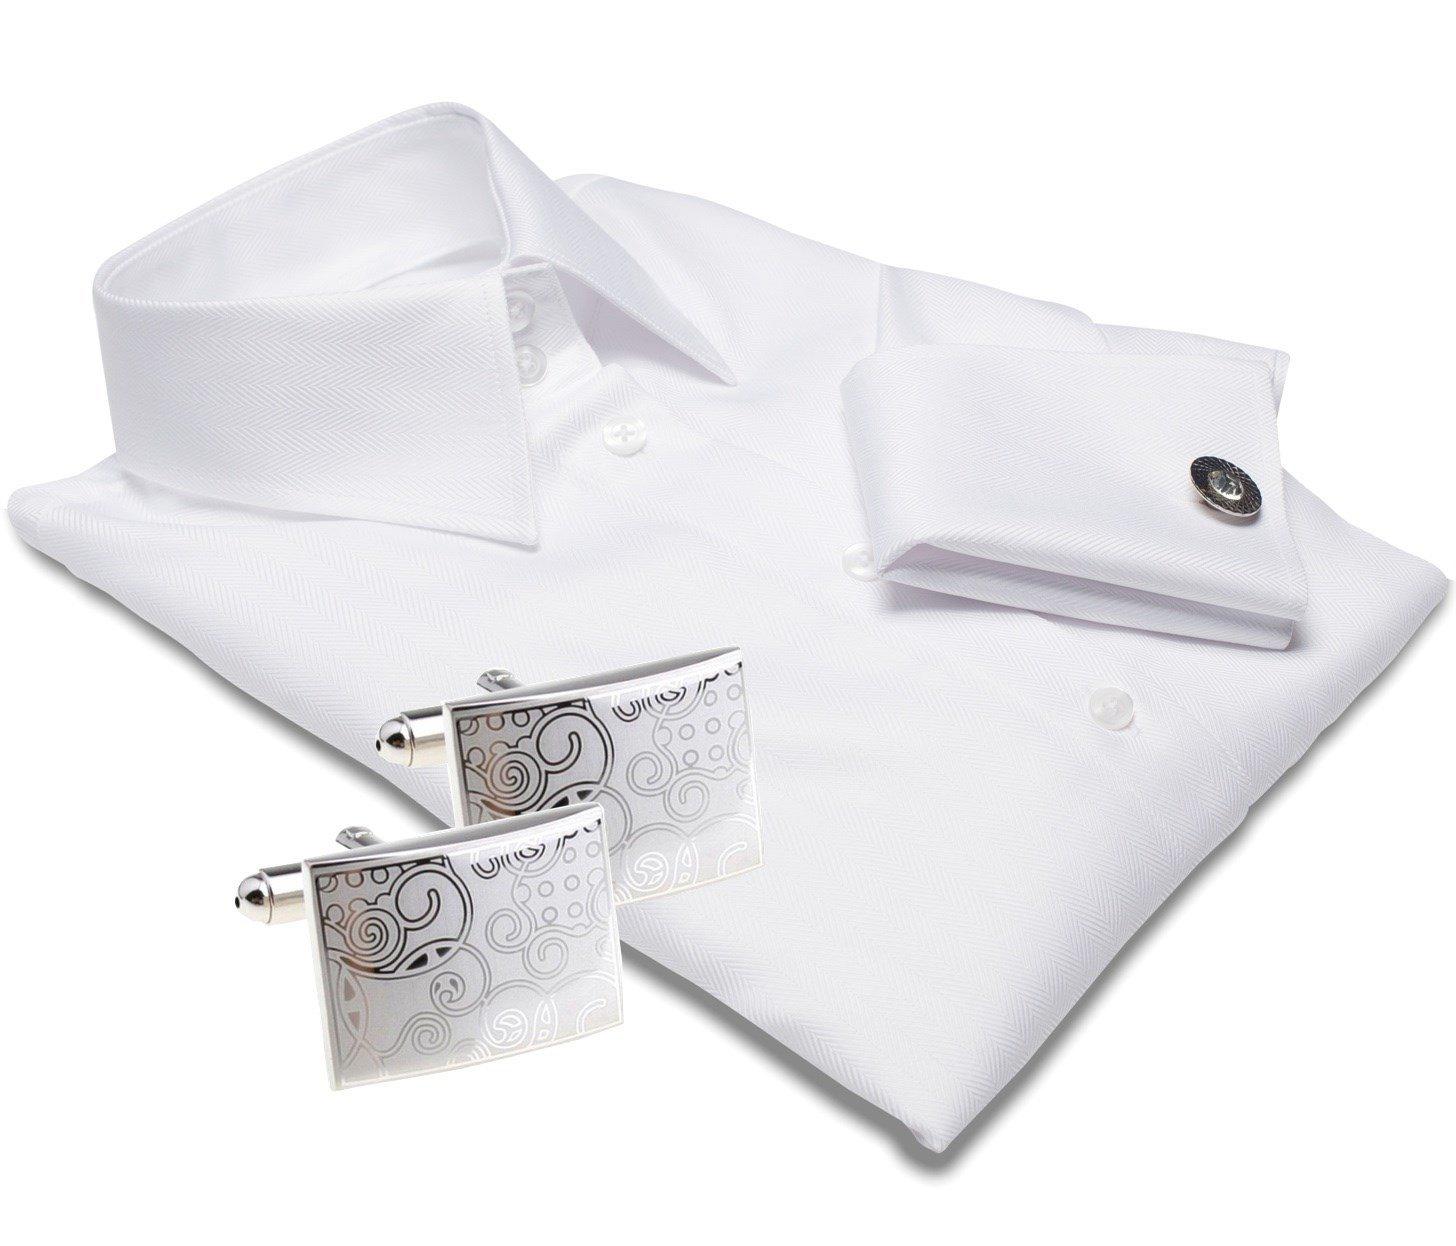 Luxurious white shirt for women